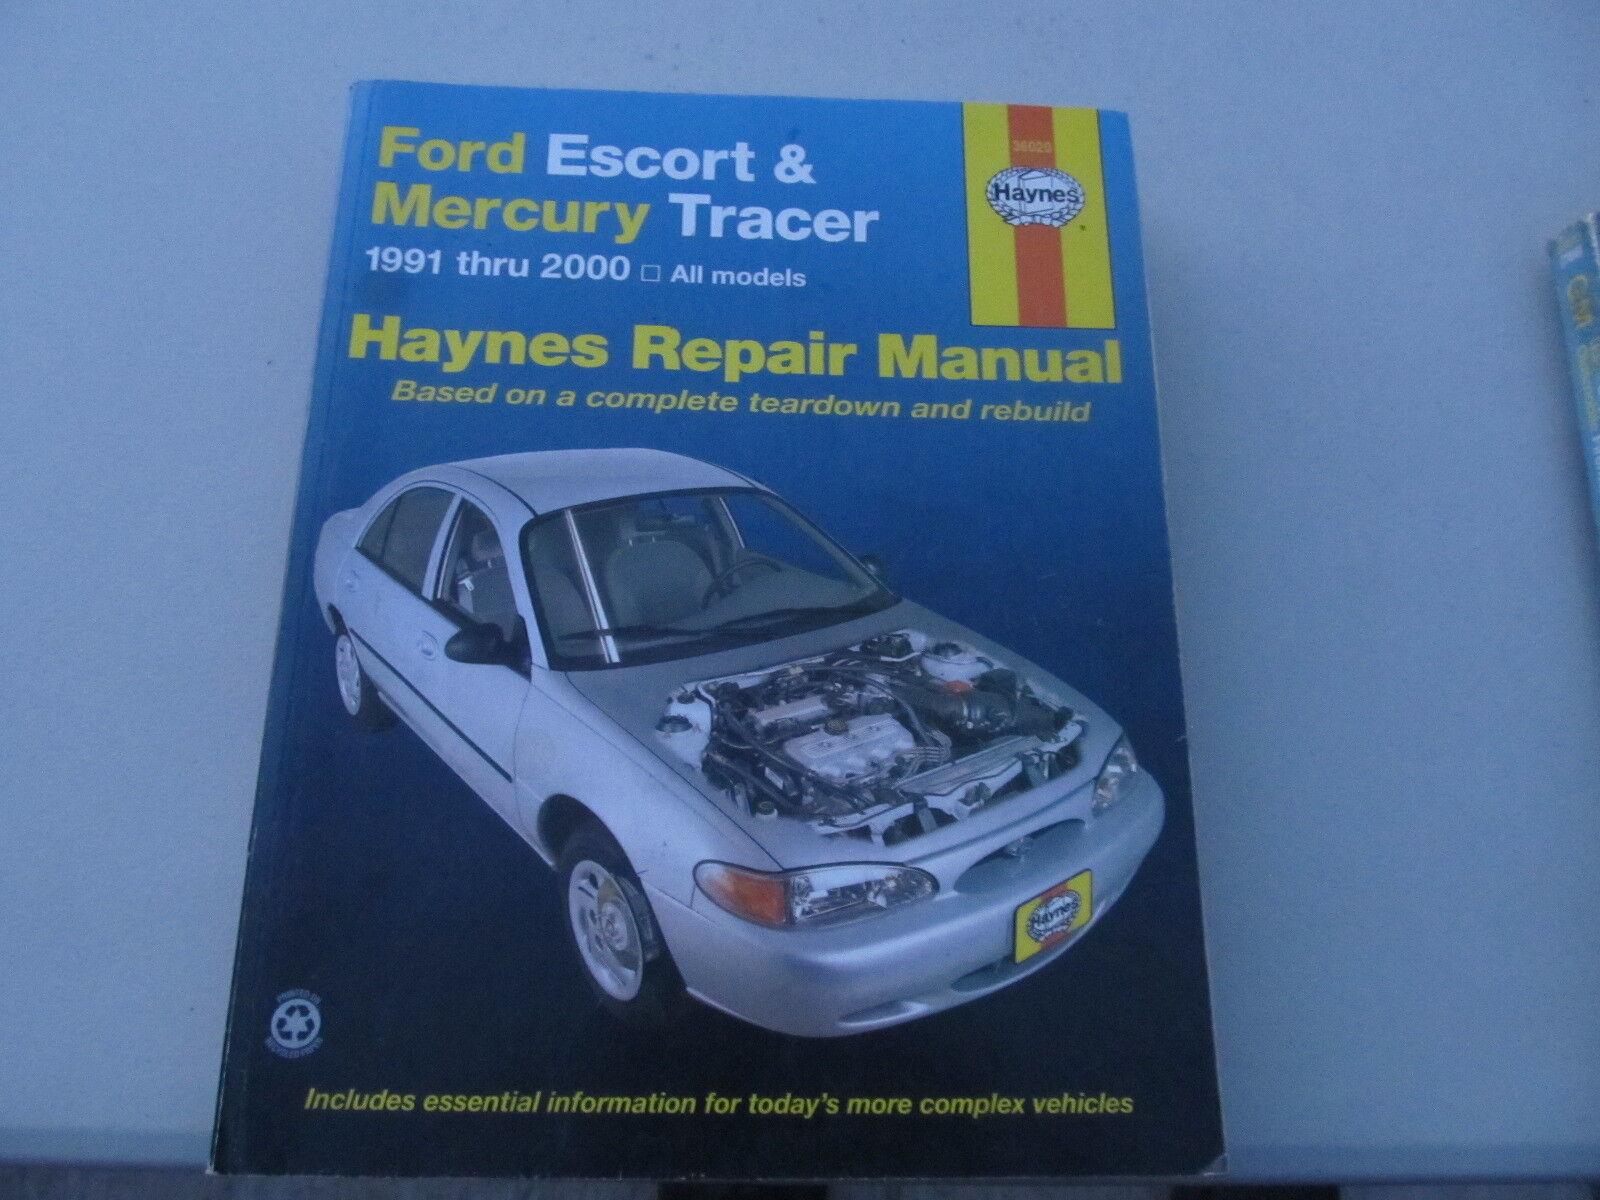 Haynes Ford Escort & Mercury Tracer 1991 through 2000 repair manual